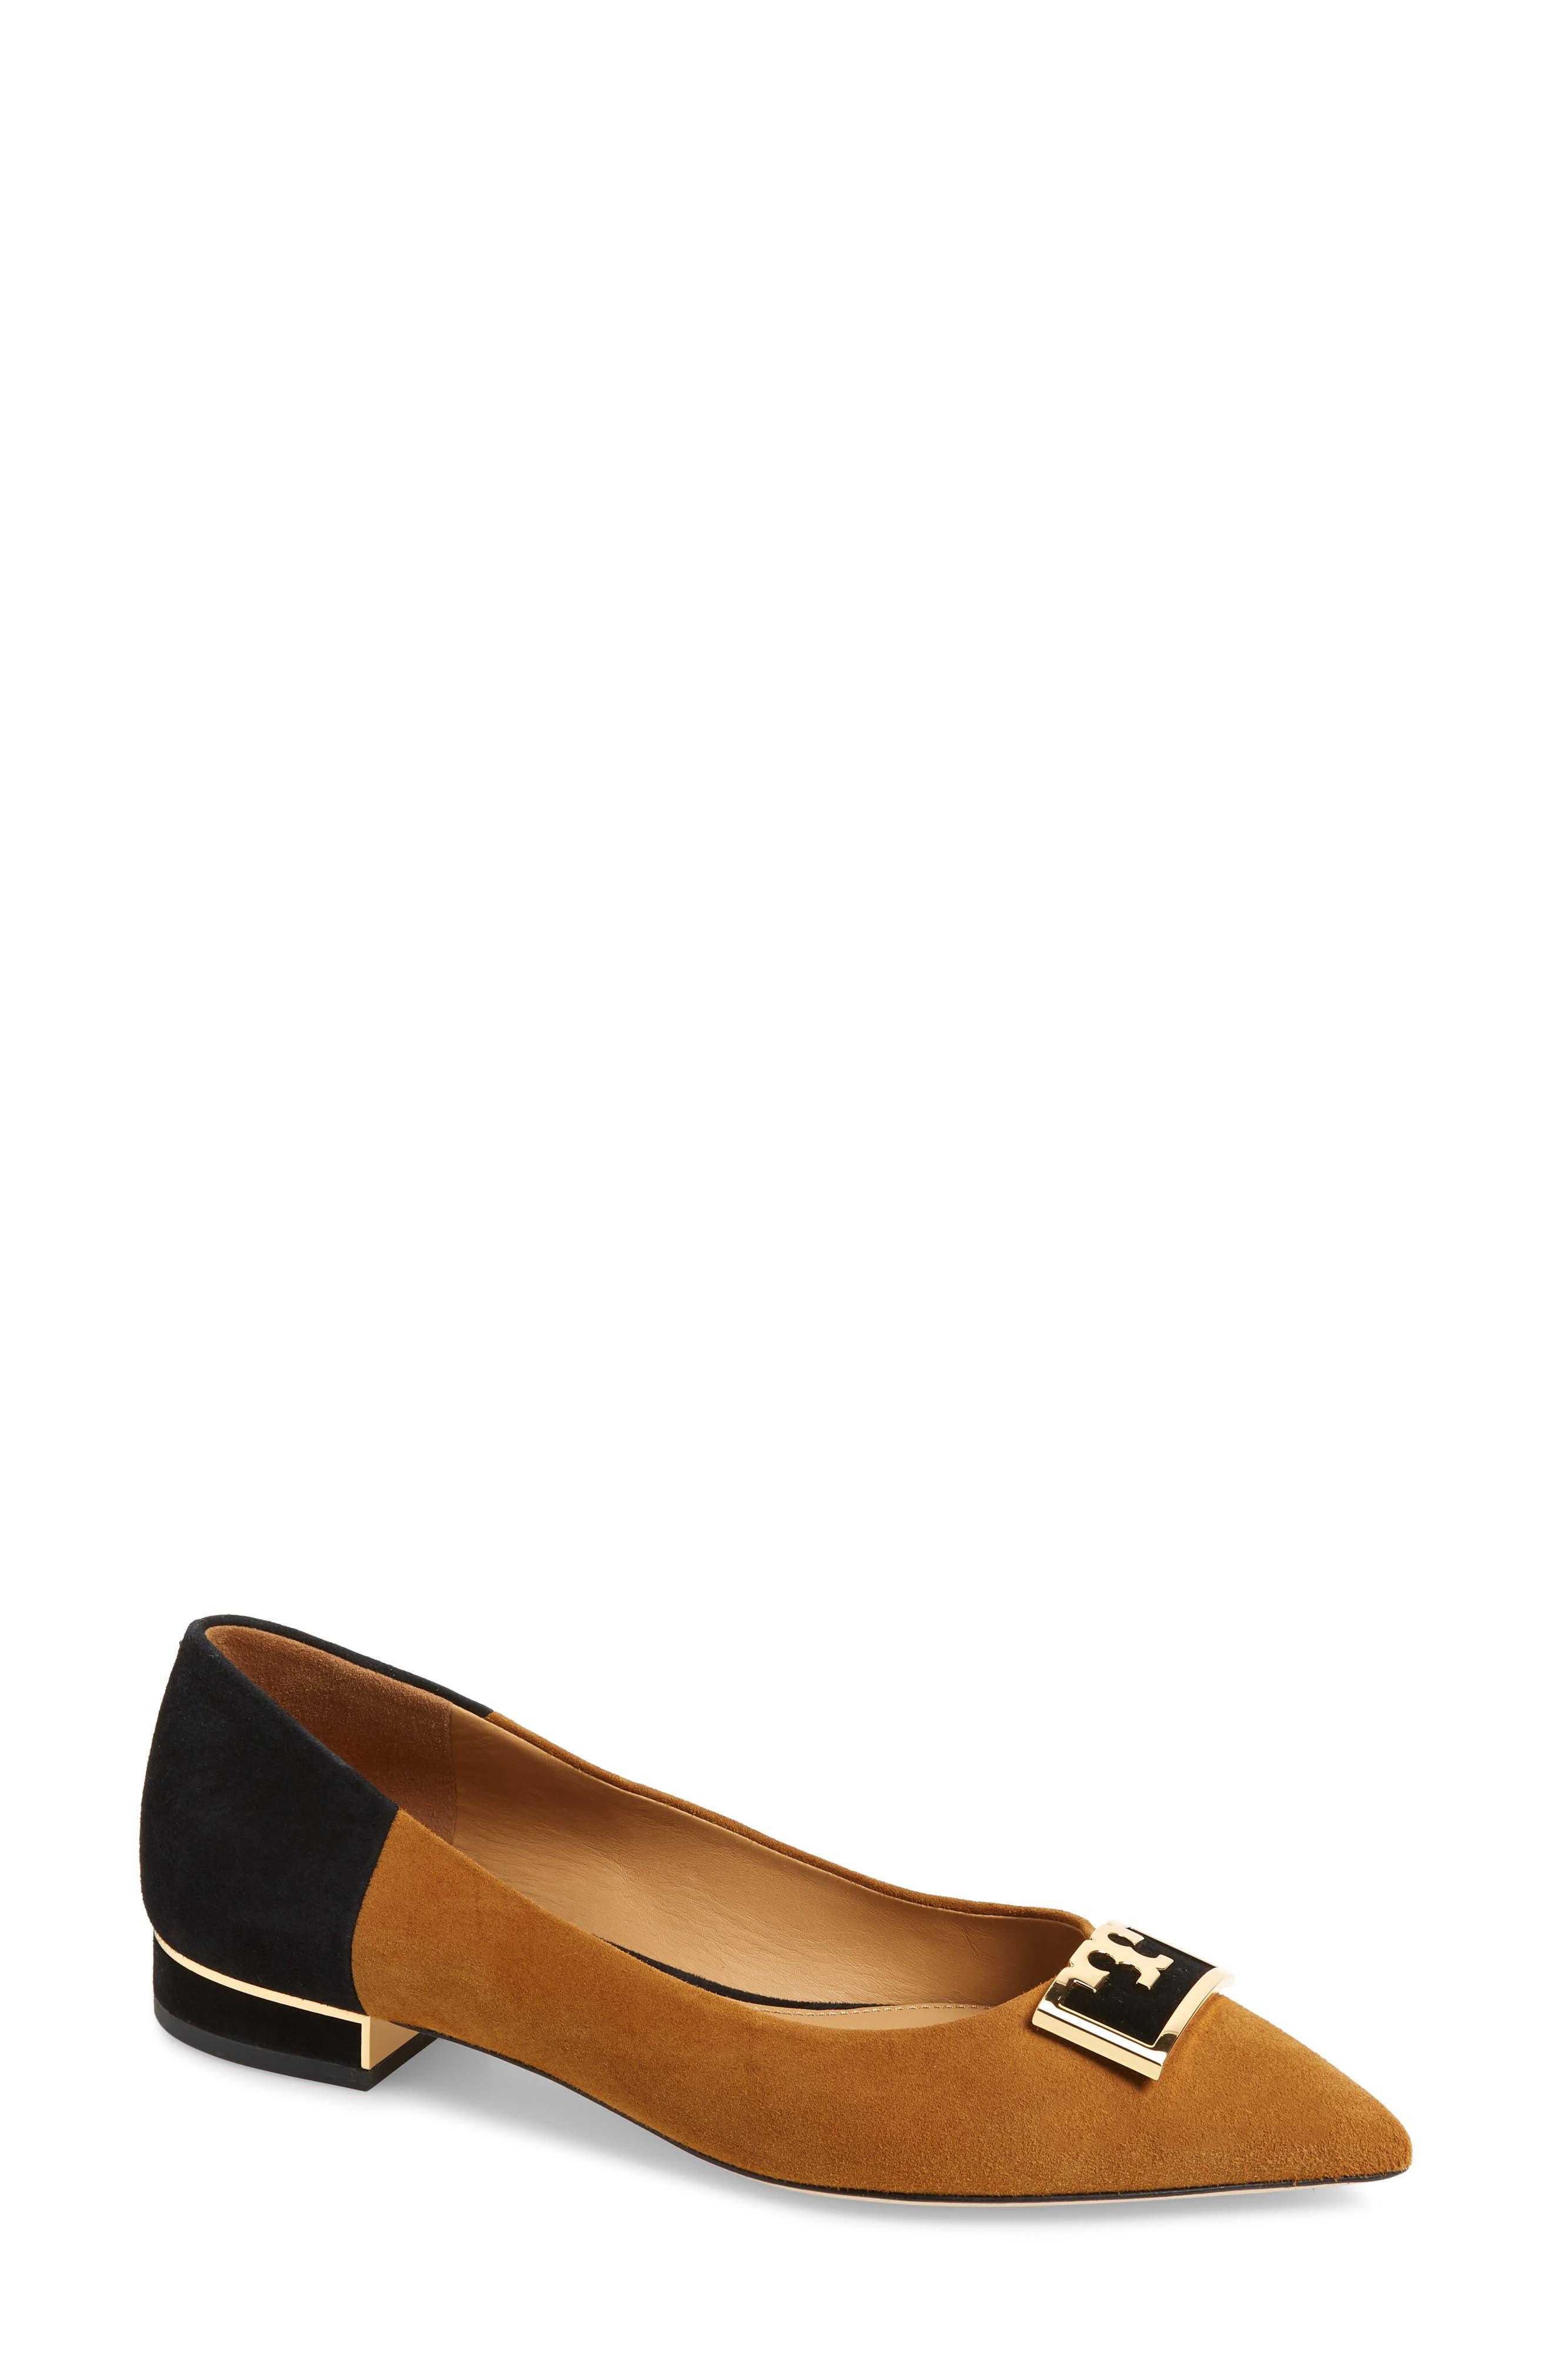 Tory Burch Gigi T Logo Pointy Toe Flat- Brown